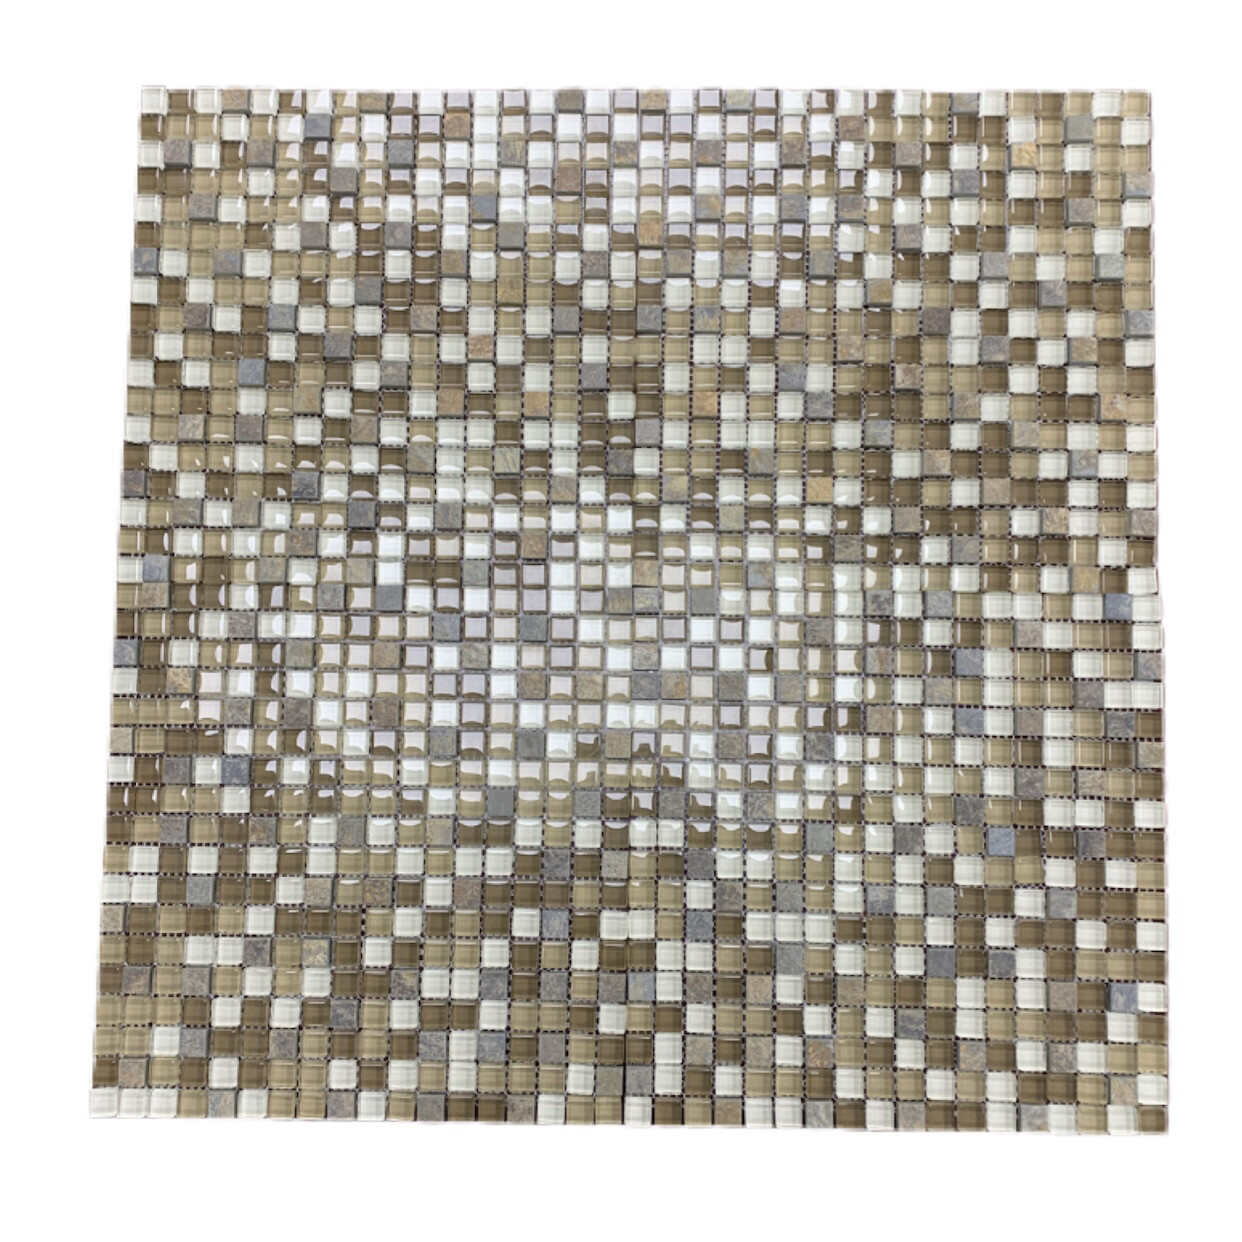 Glass Mosaic & Matt Stone Tile